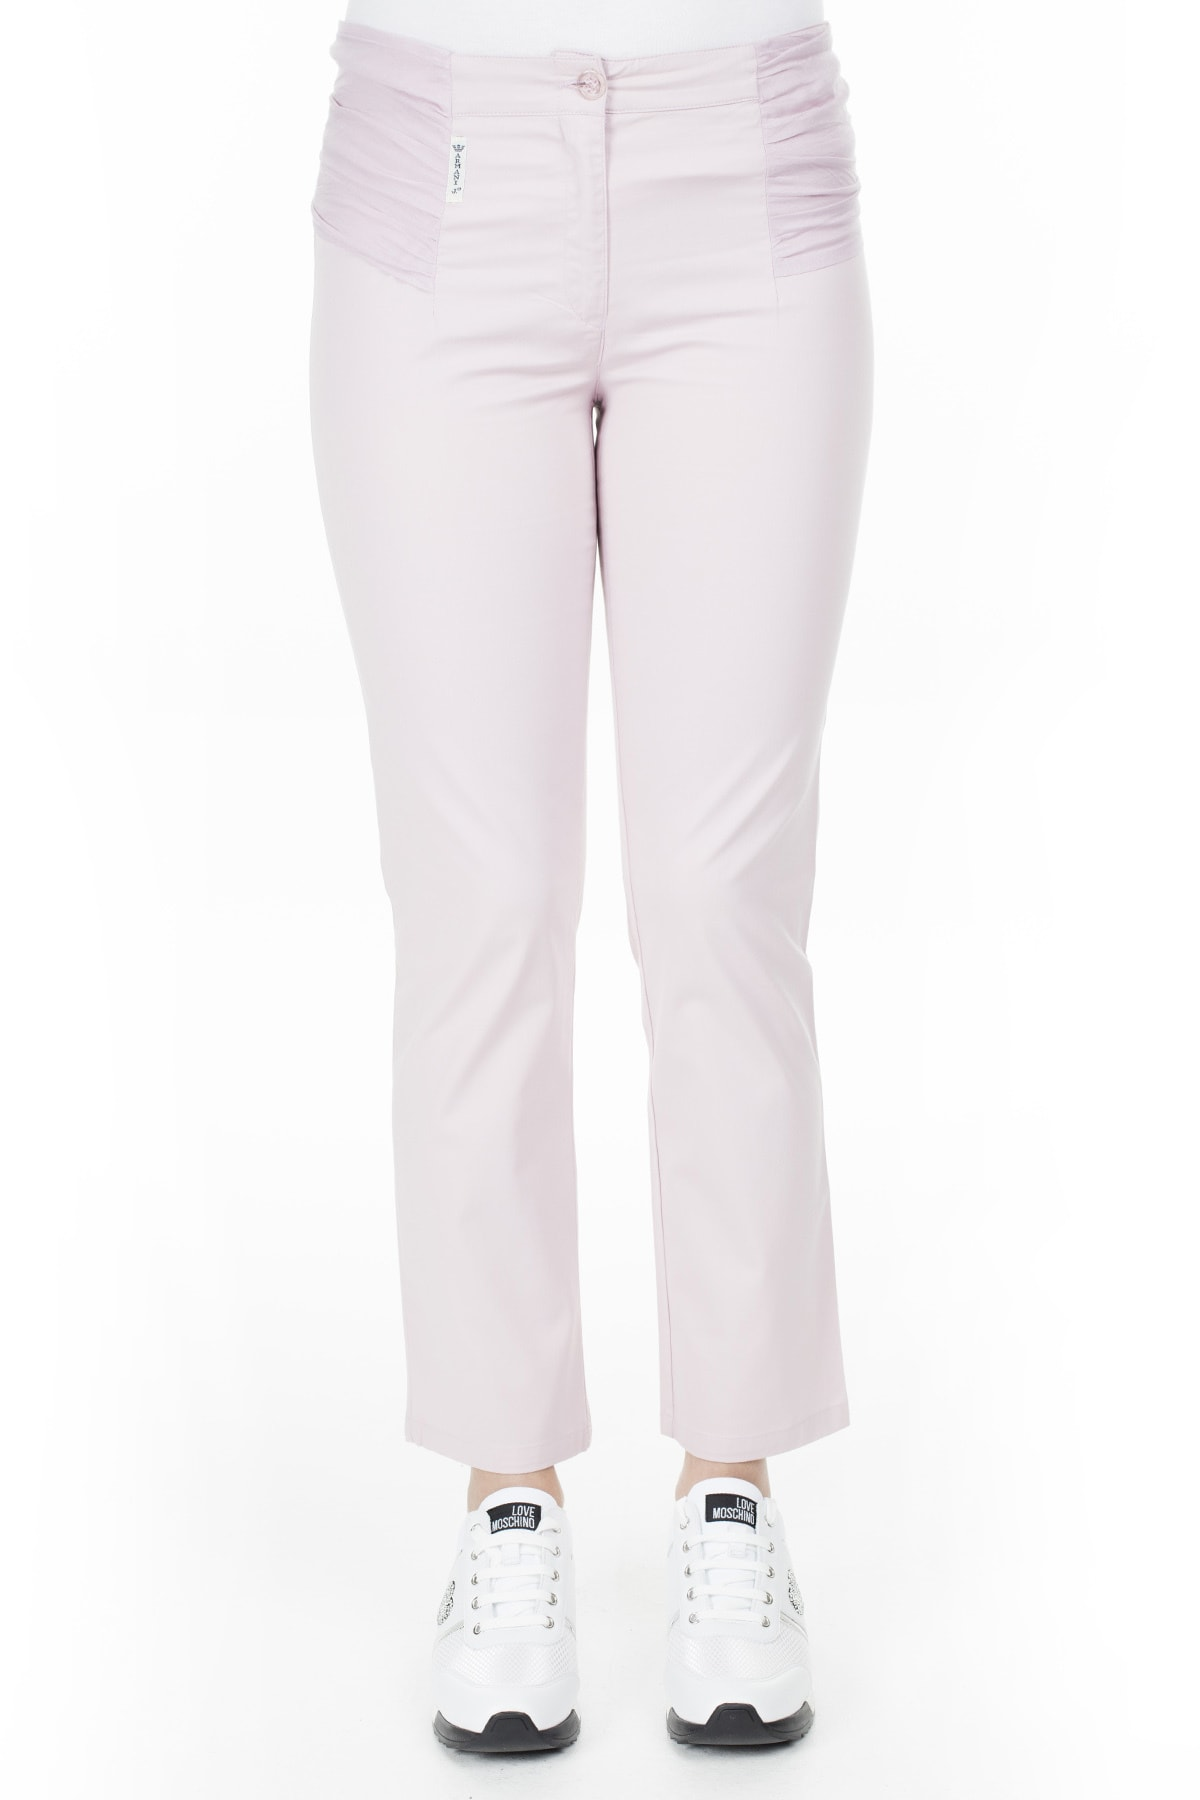 Armani Jeans Kadın Pembe Pantolon Zoxbsp10Pl 2